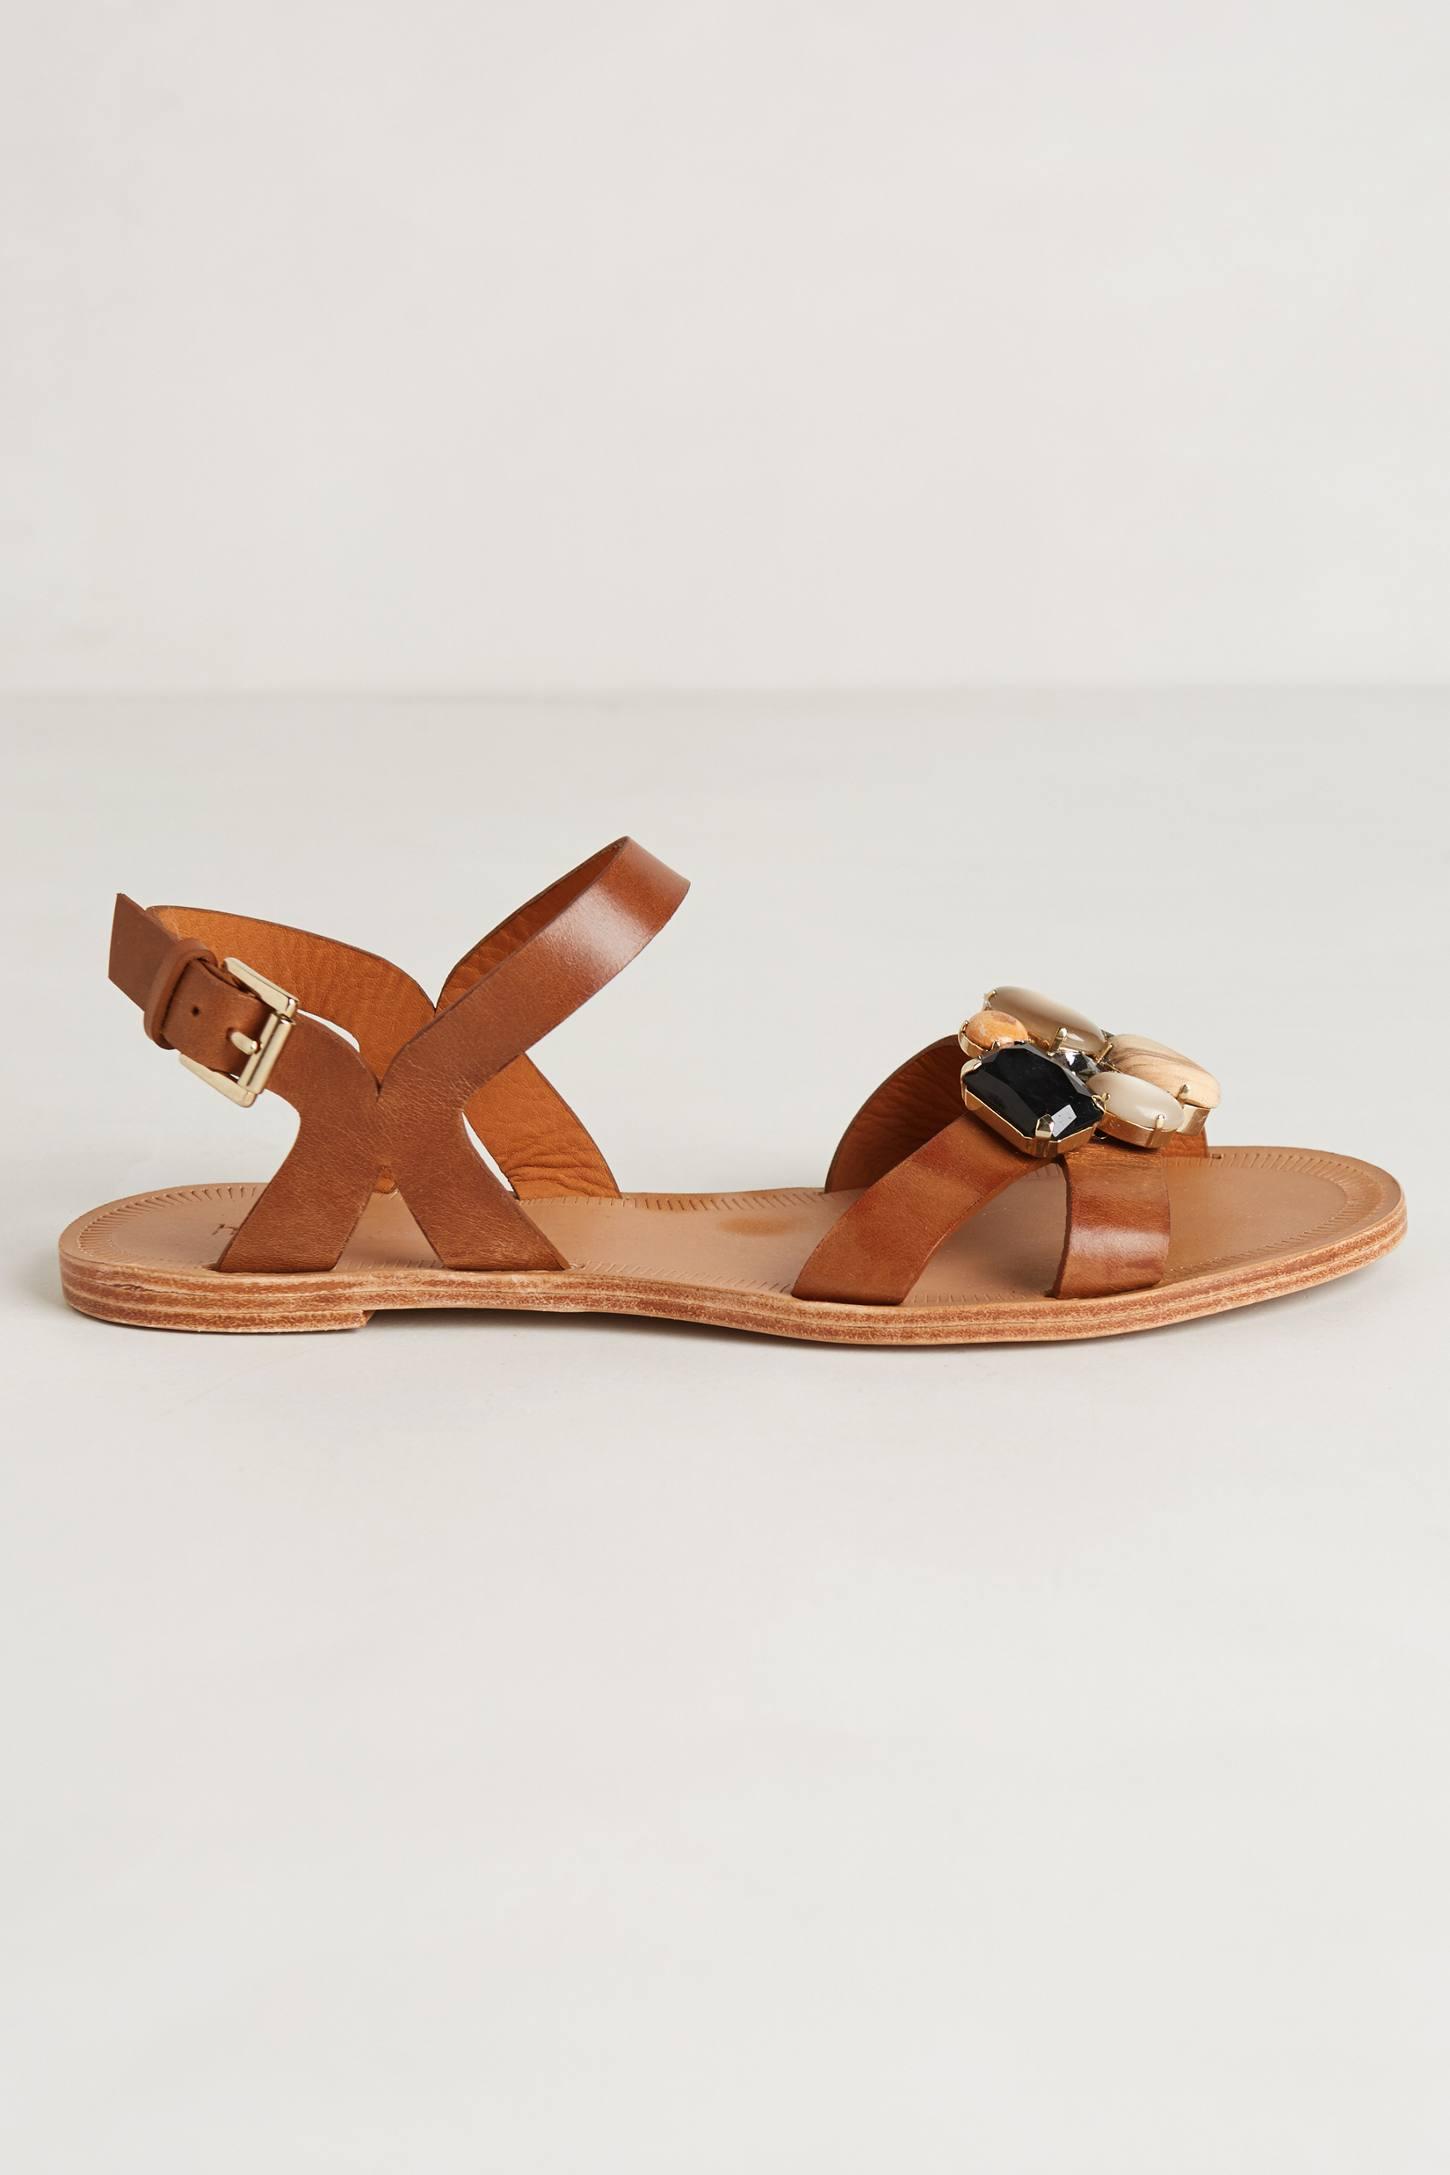 A buon mercatohoss intropia sandals. New sulla vendita